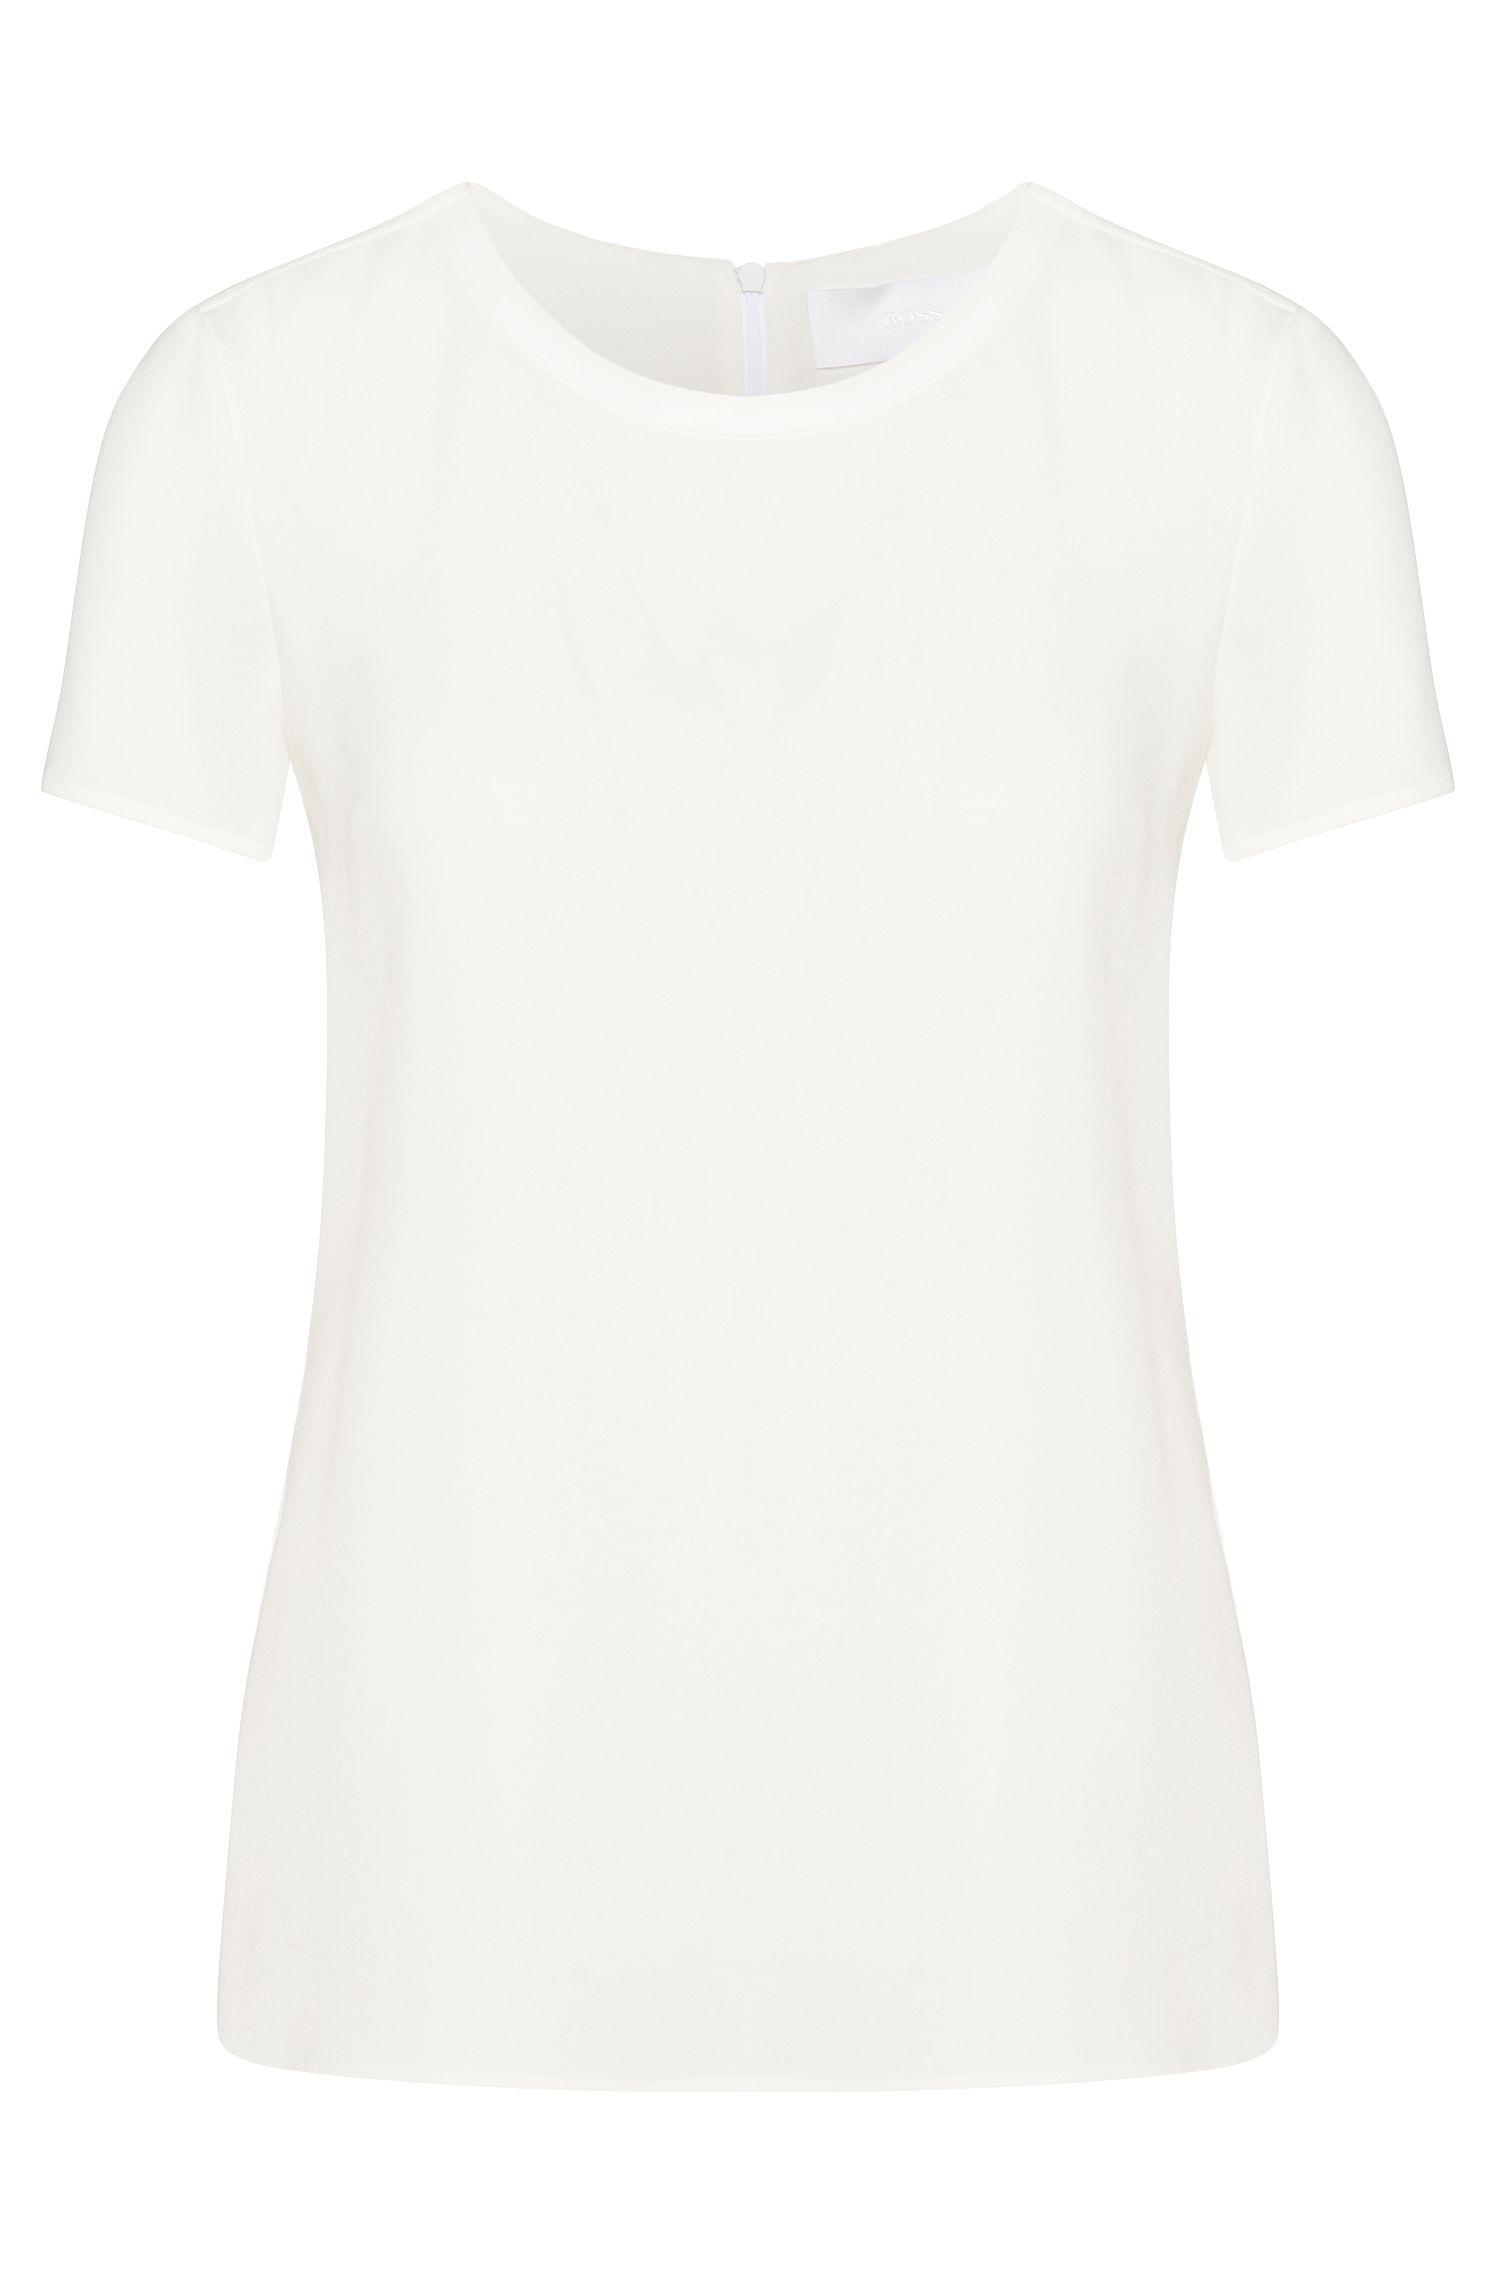 Tere, elegante crêpetop van BOSS Womenswear Fundamentals